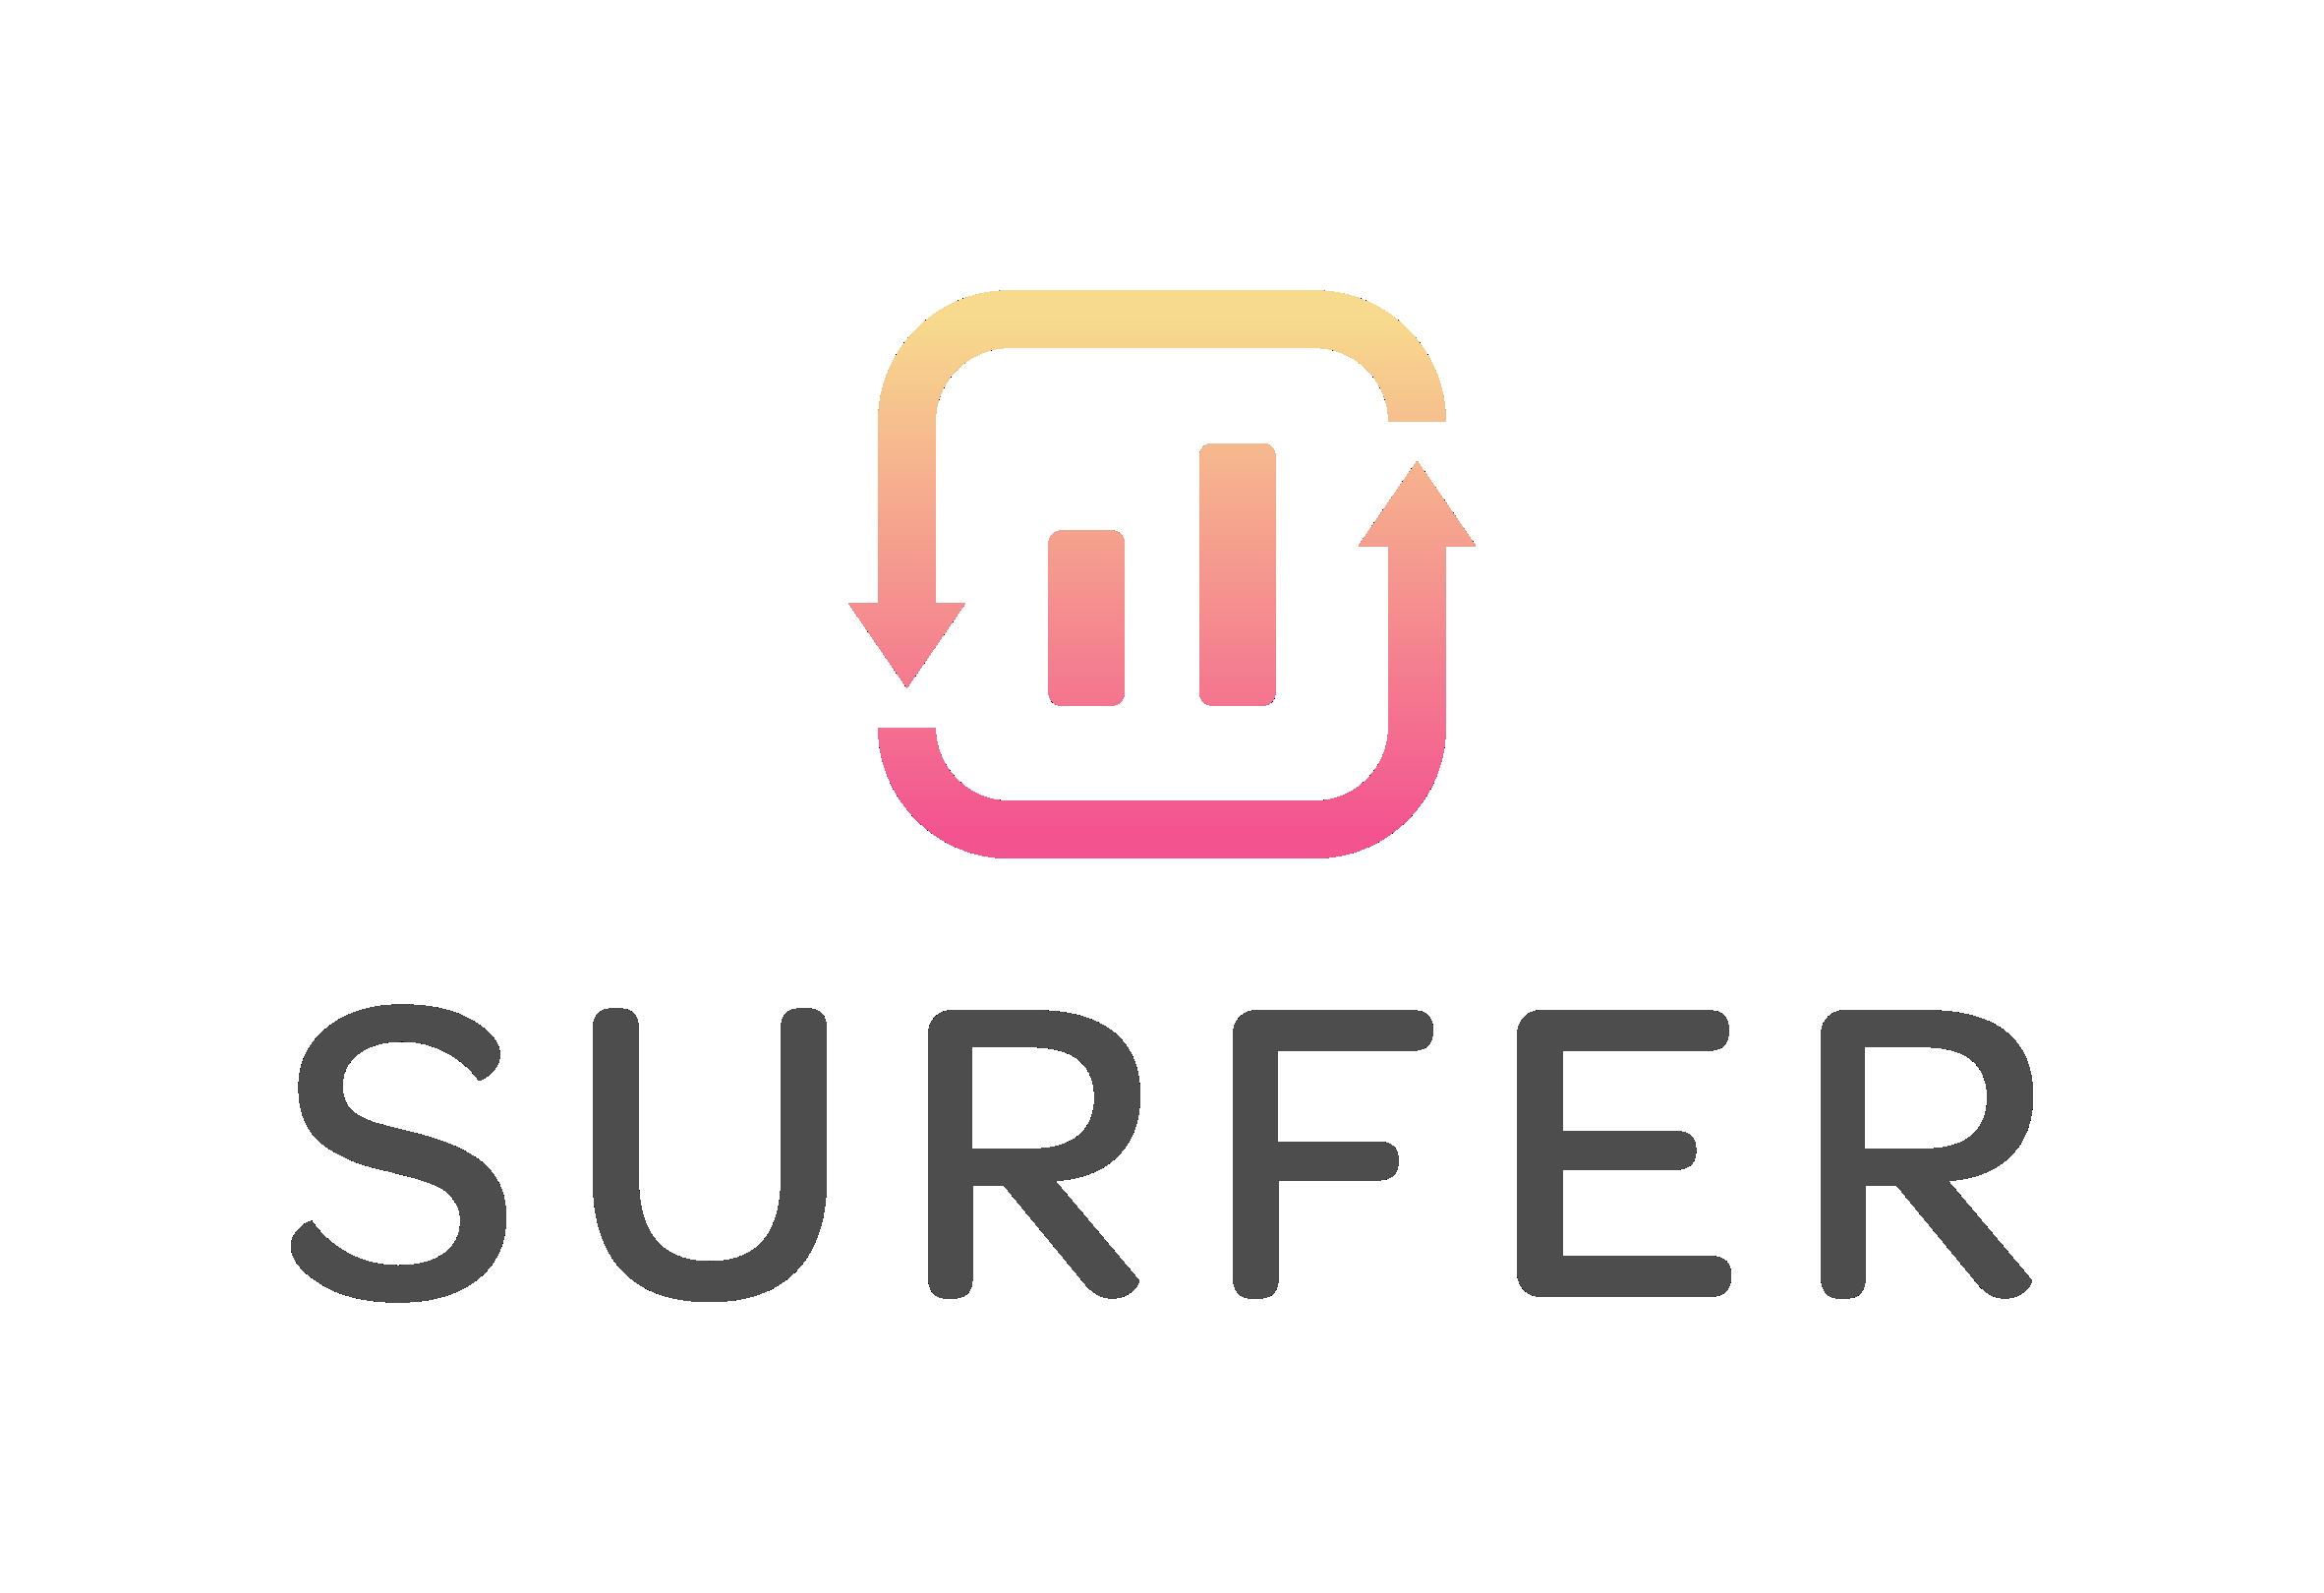 surferseo